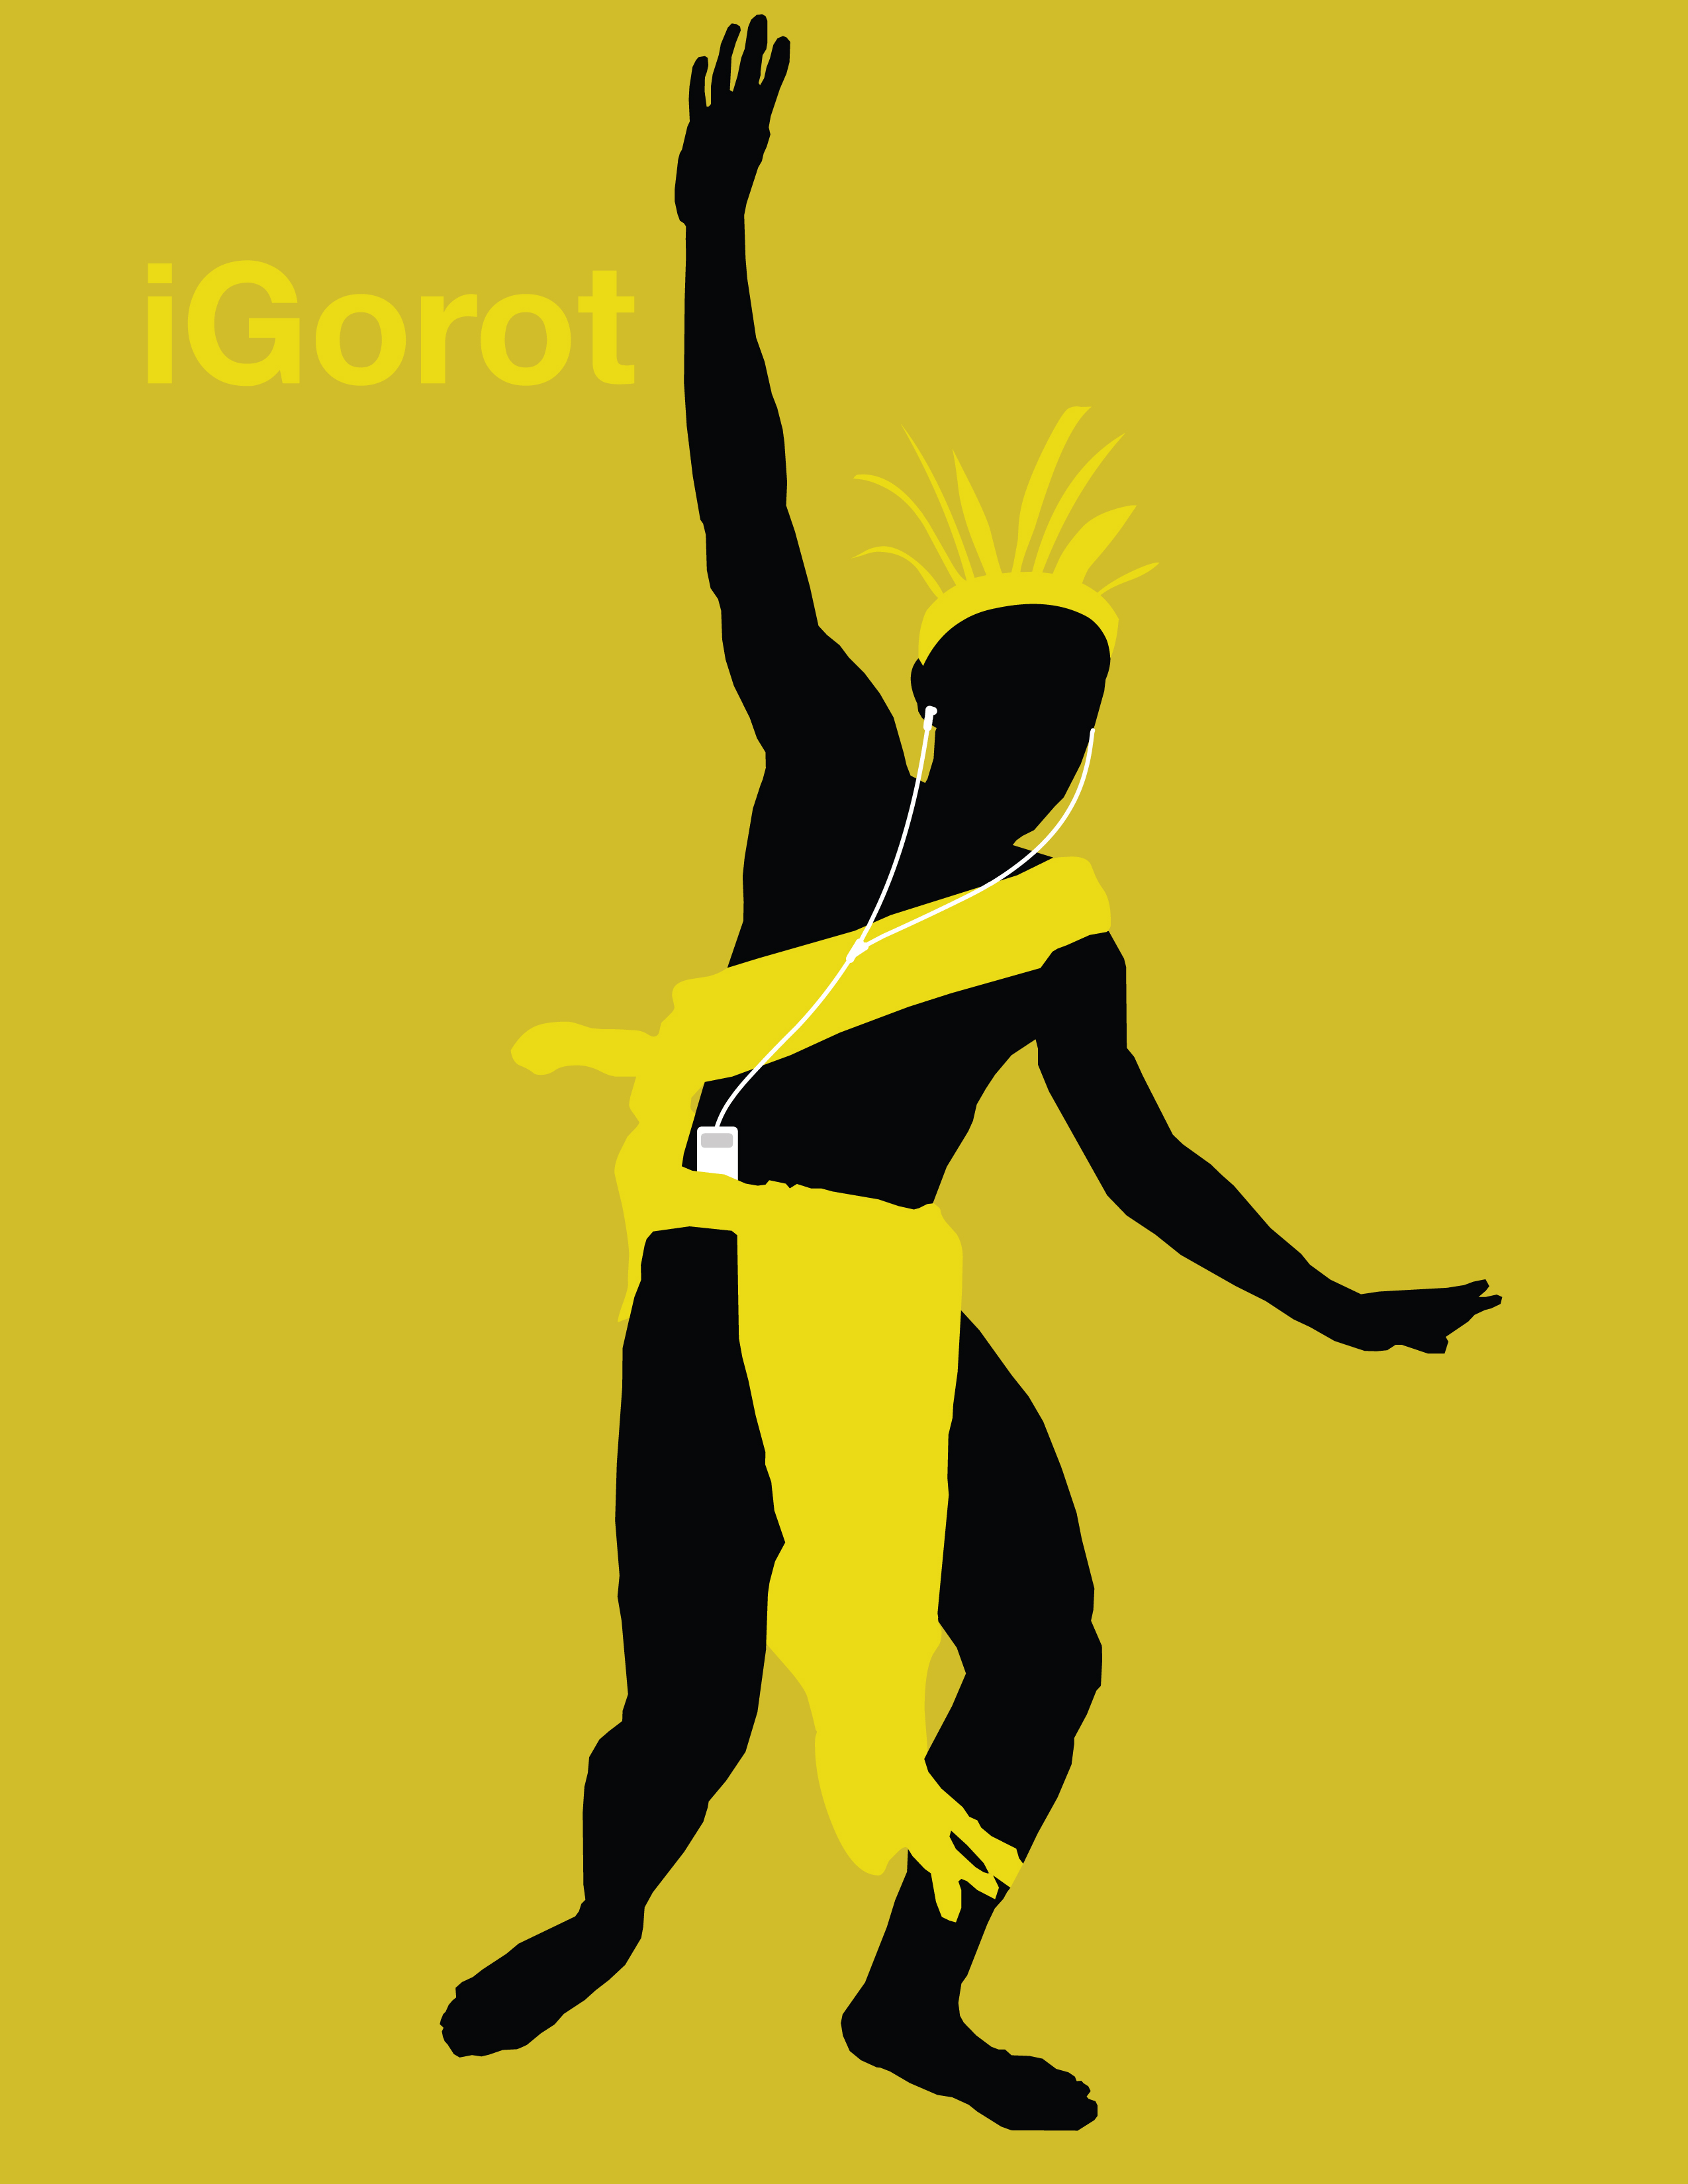 Essay About Igorot